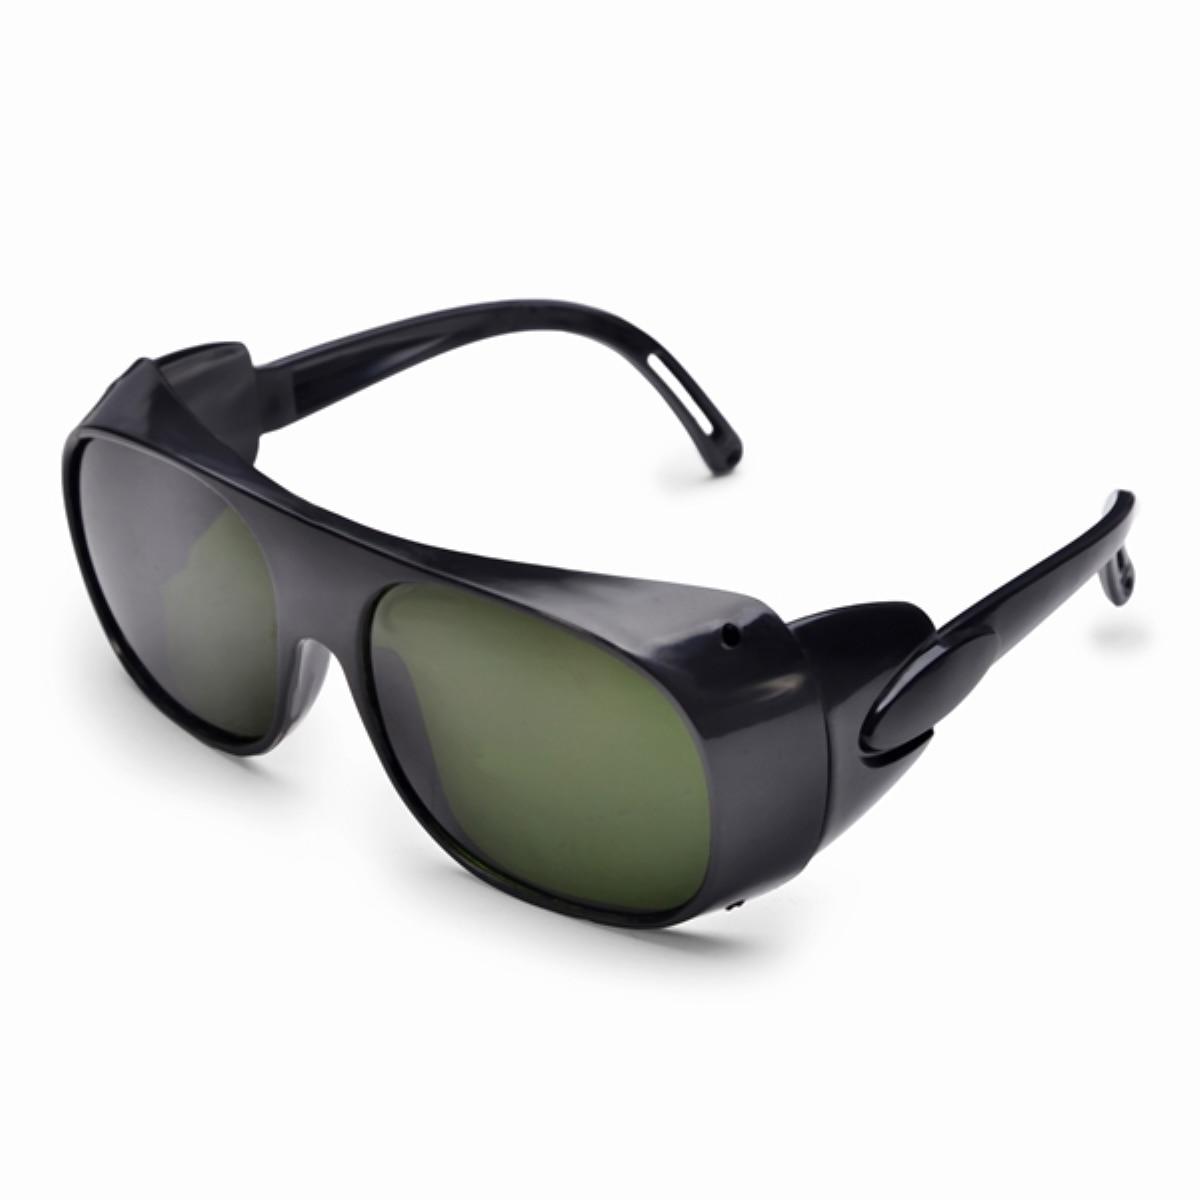 Laser Safety Glasses Red 600-700nm Laser Safety Glasses Laser Protective Goggles For Laser Engraving Machine